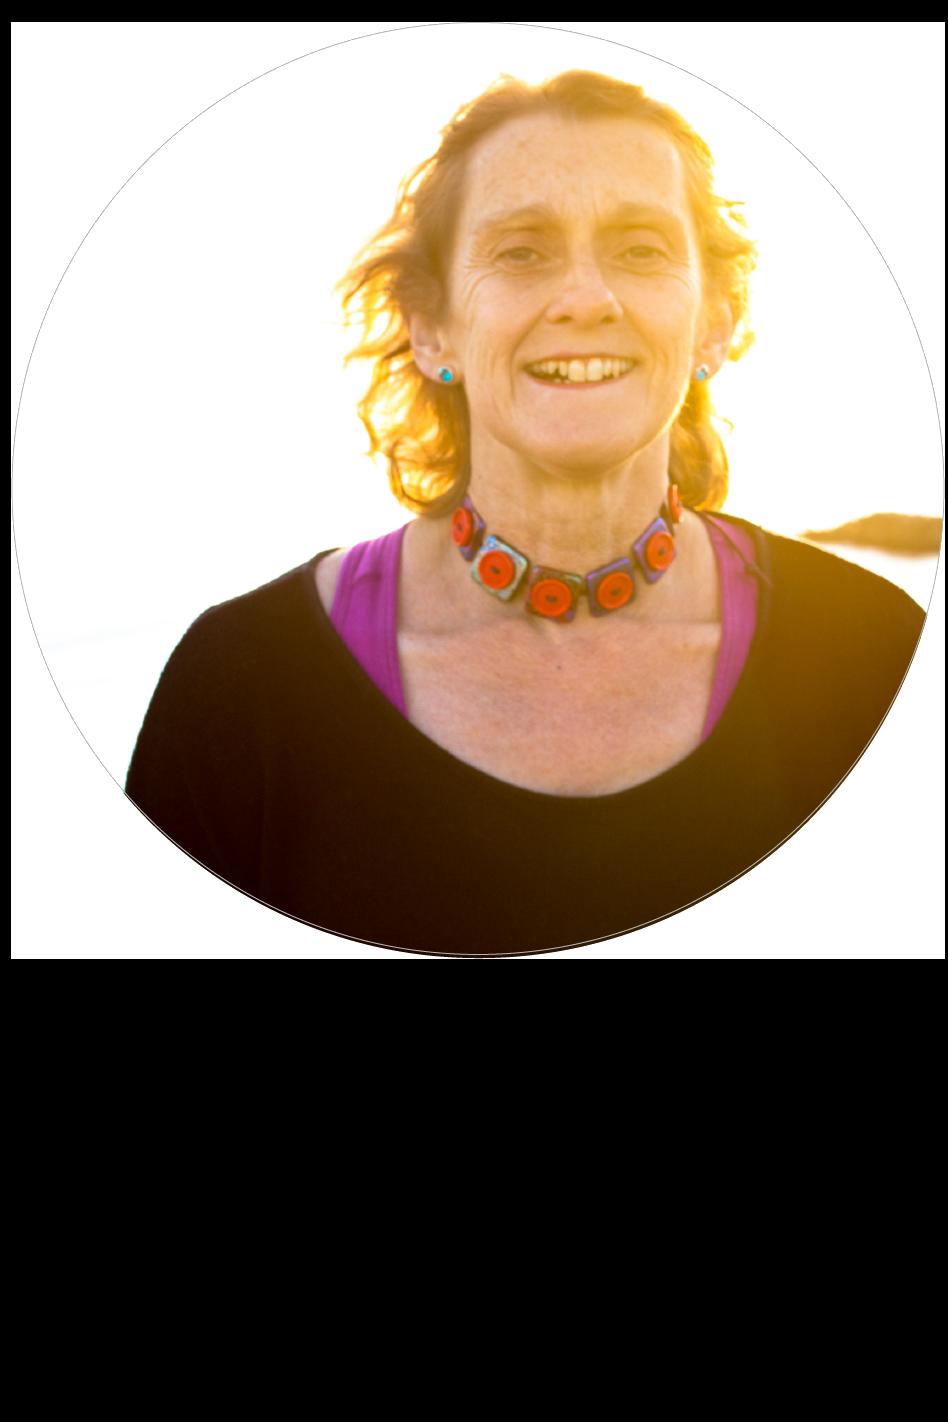 Yoga teacher Christchurch, Dorset